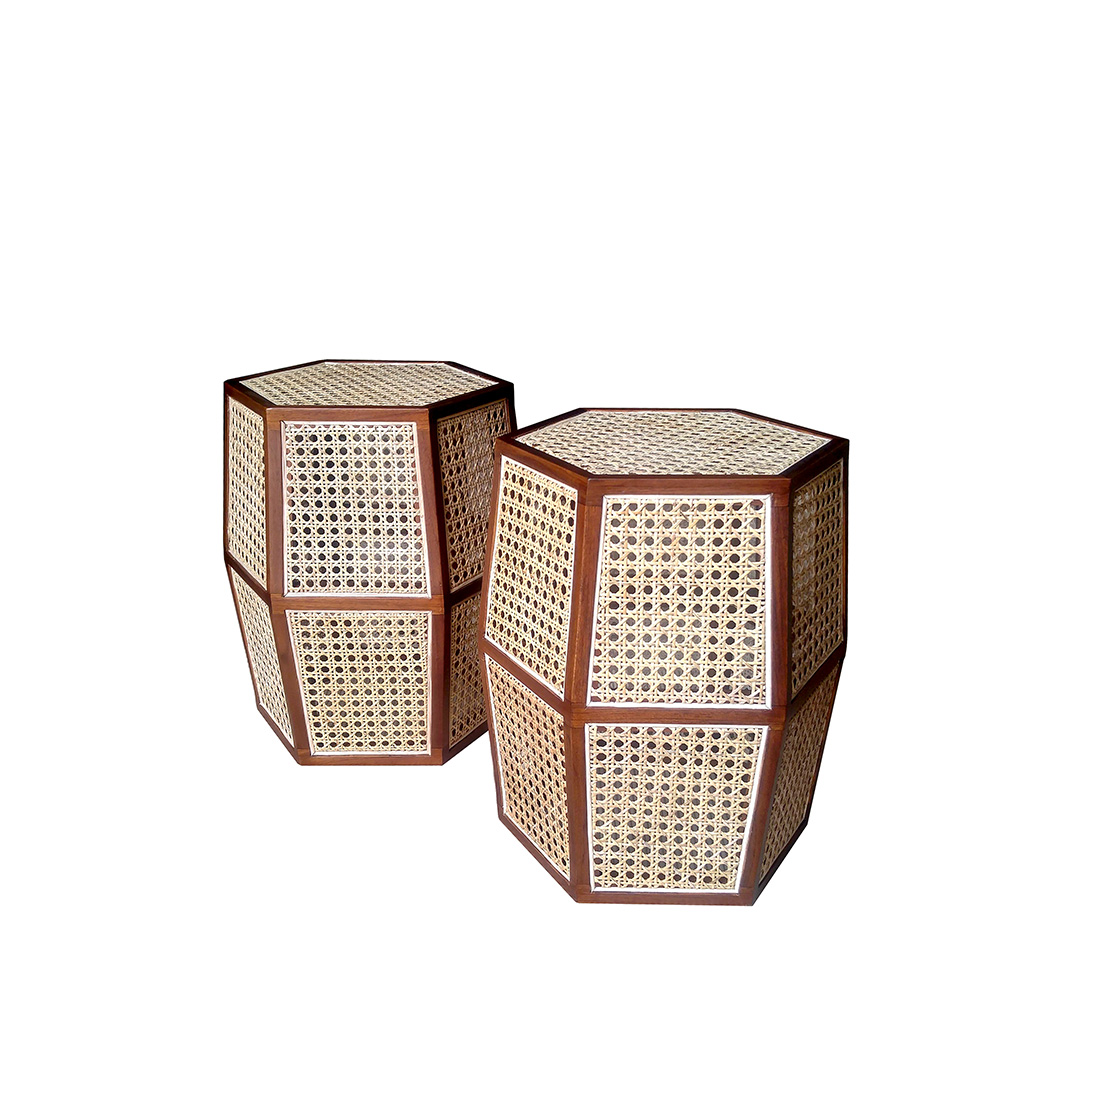 rattan-drum-stool-4.jpg